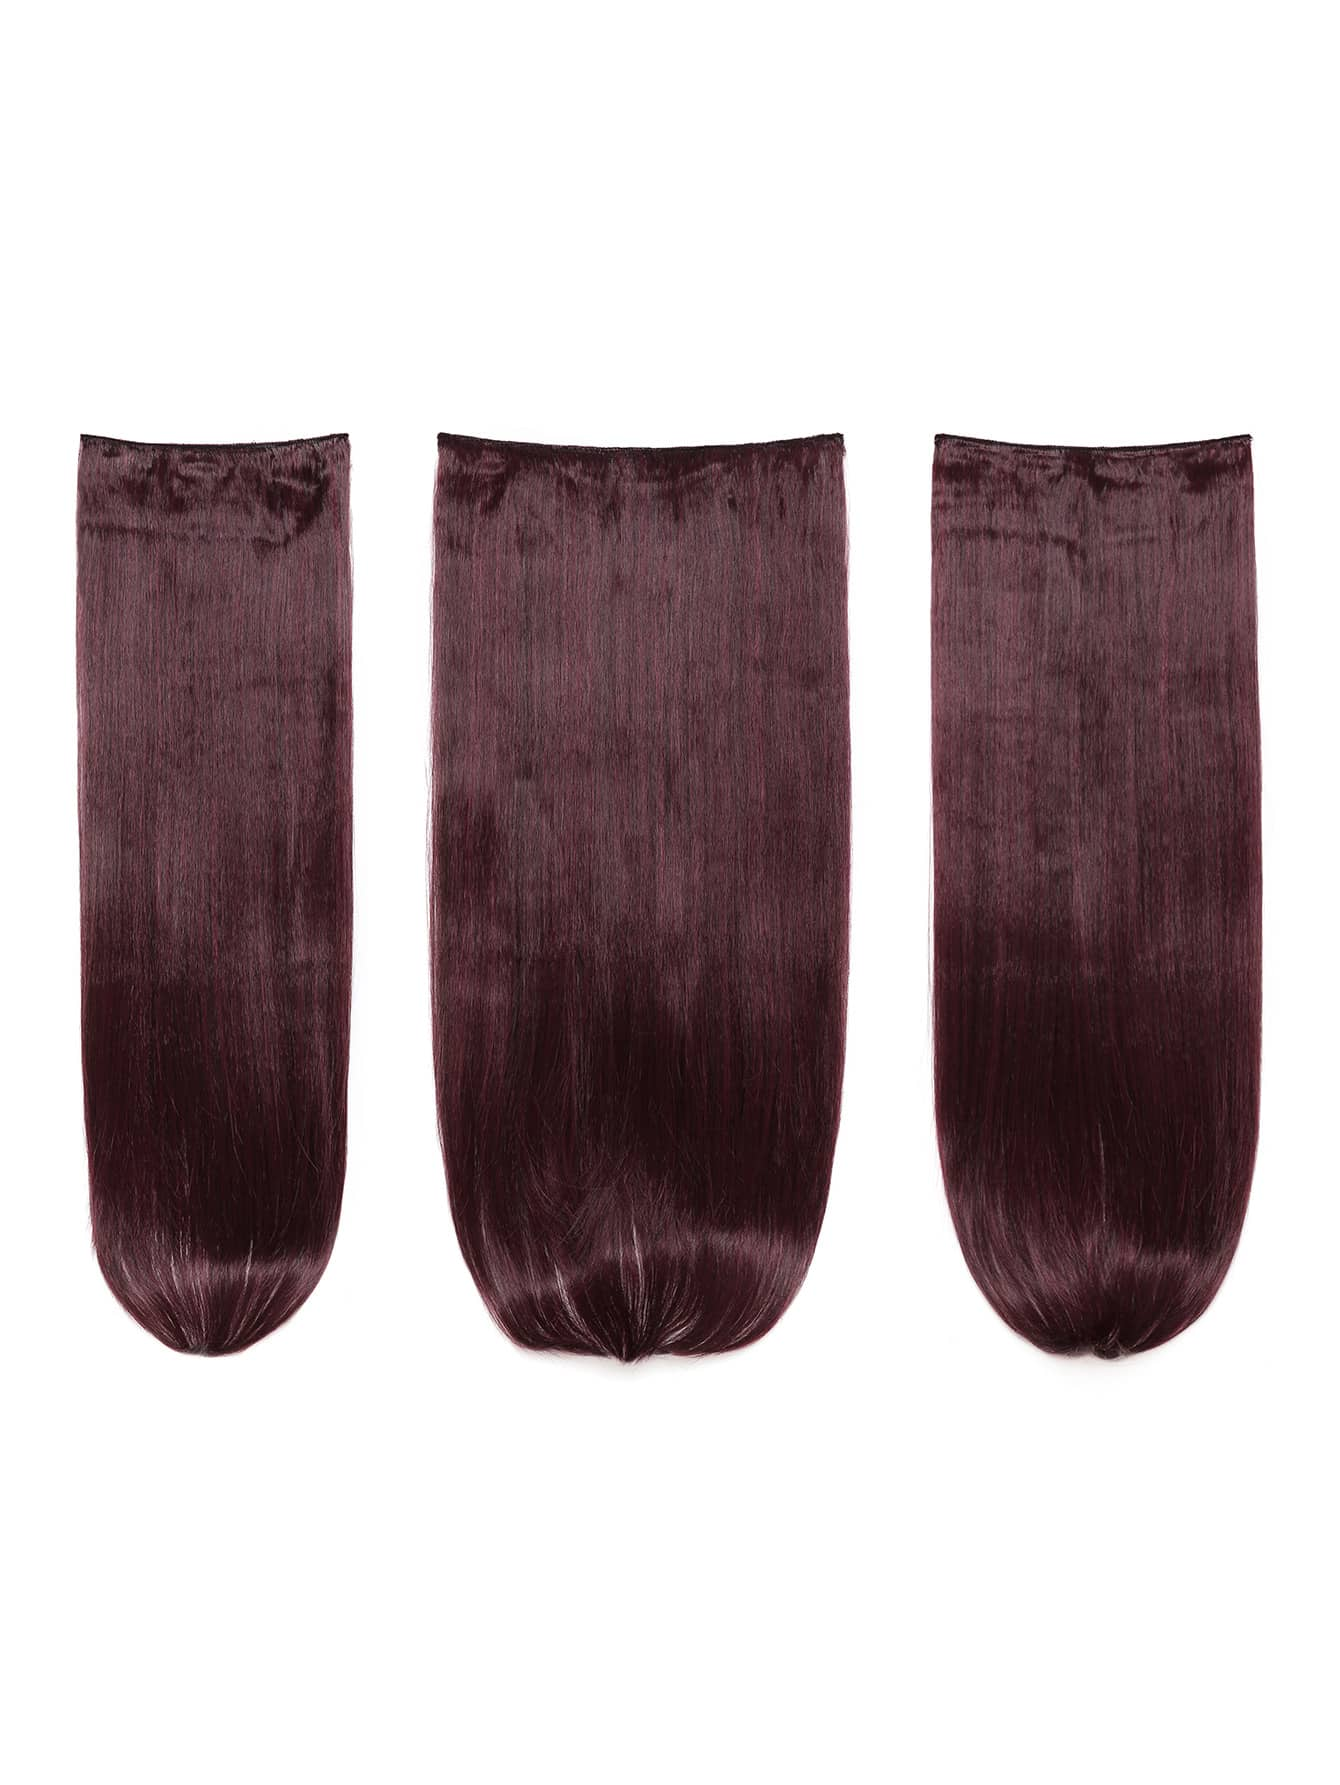 Black & Burgundy Clip In Straight Hair Extension 3pcs